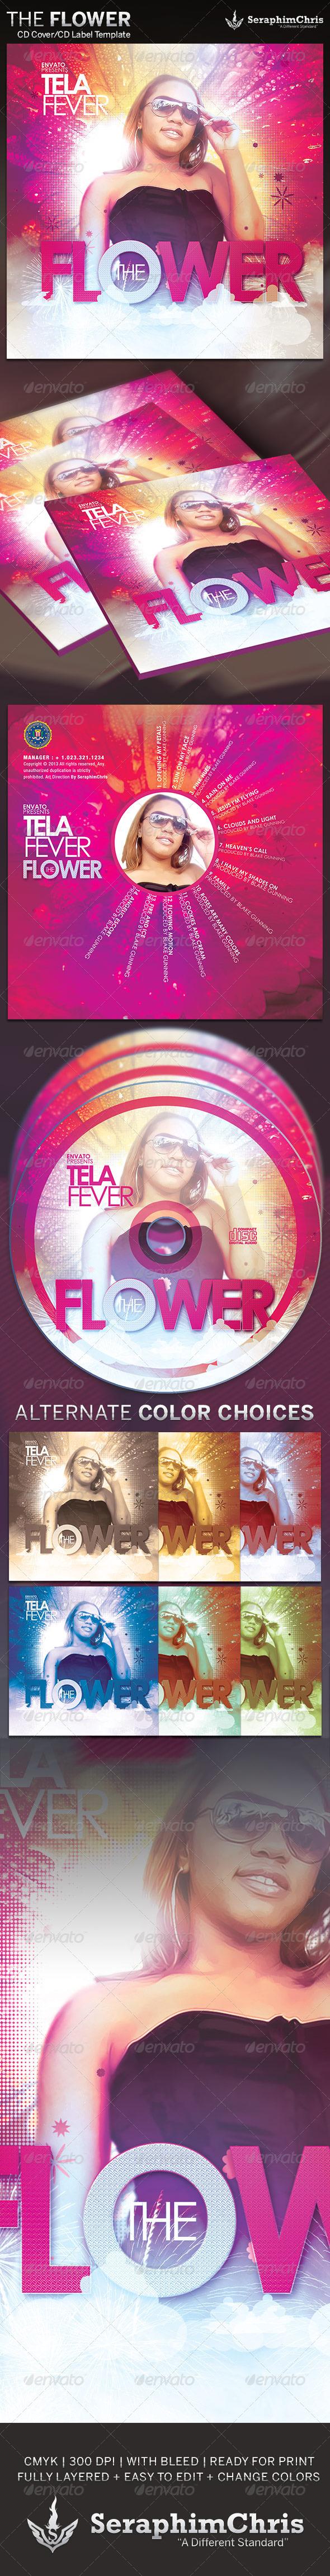 The Flower: CD Cover Artwork Template - CD & DVD Artwork Print Templates